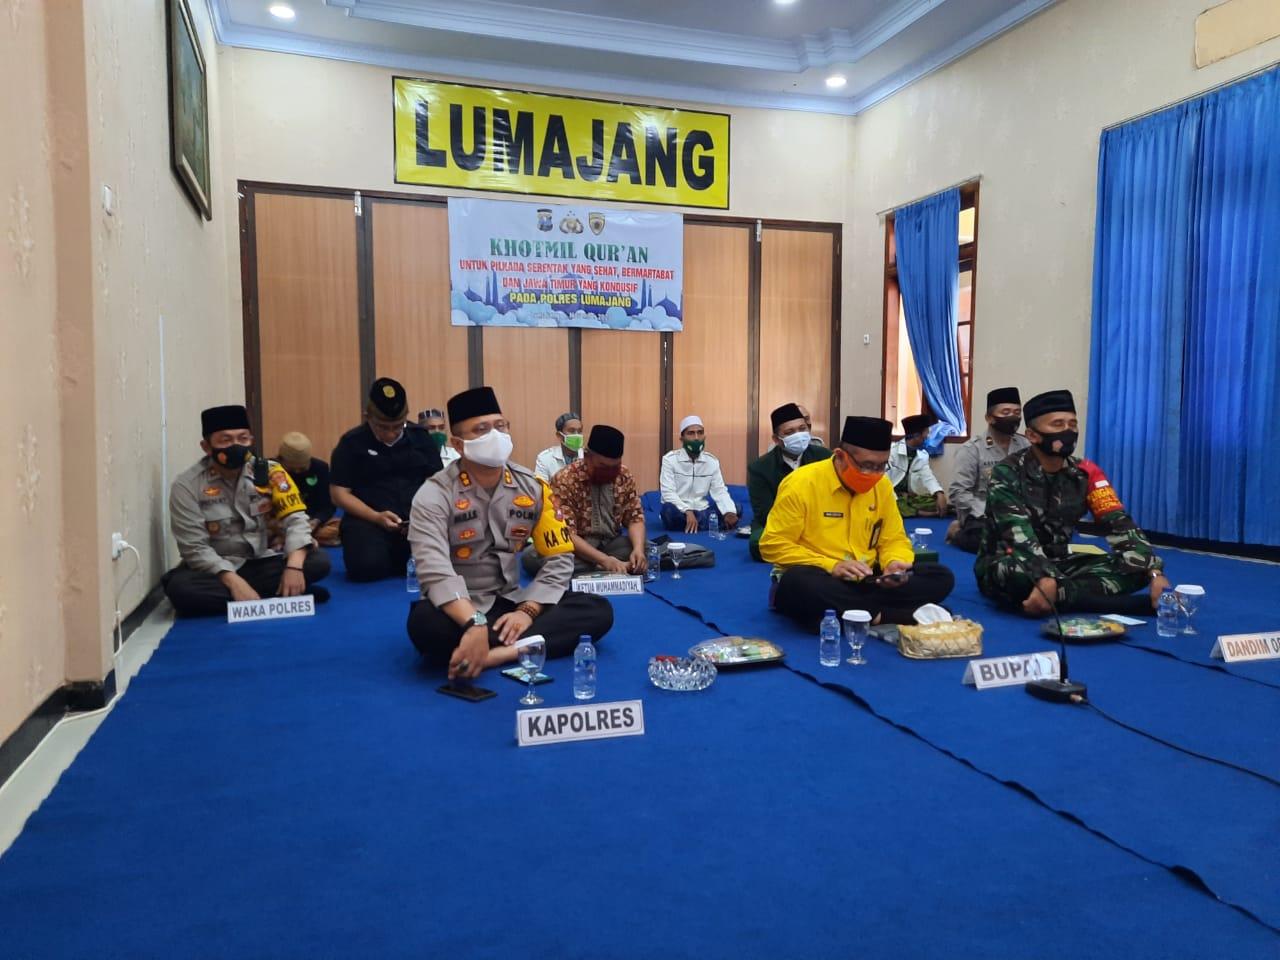 Kapolres Lumajang AKBP Deddy Foury Laksanakan Khotmil Quran